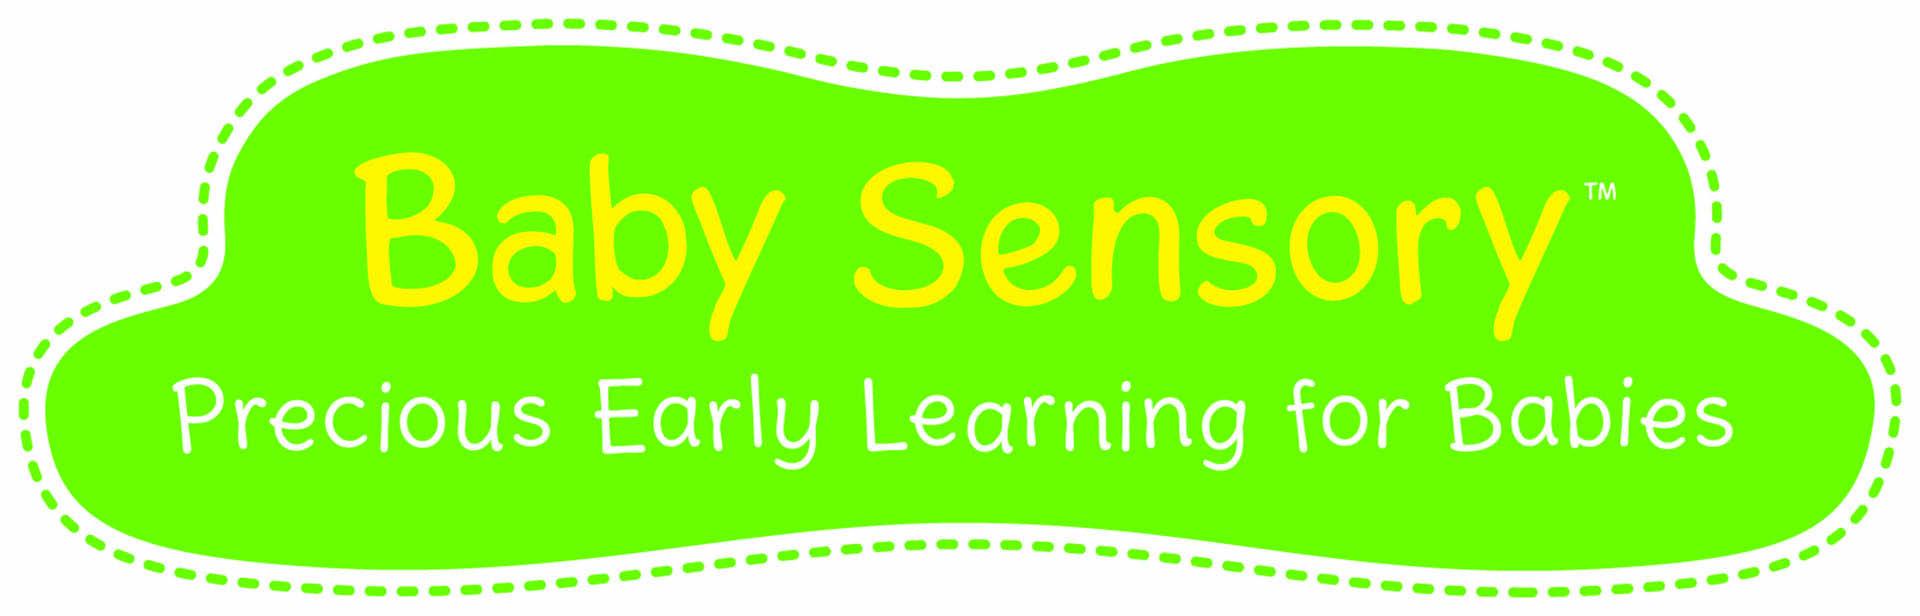 Baby Sensory Inverclyde/Renfrewshire 's logo